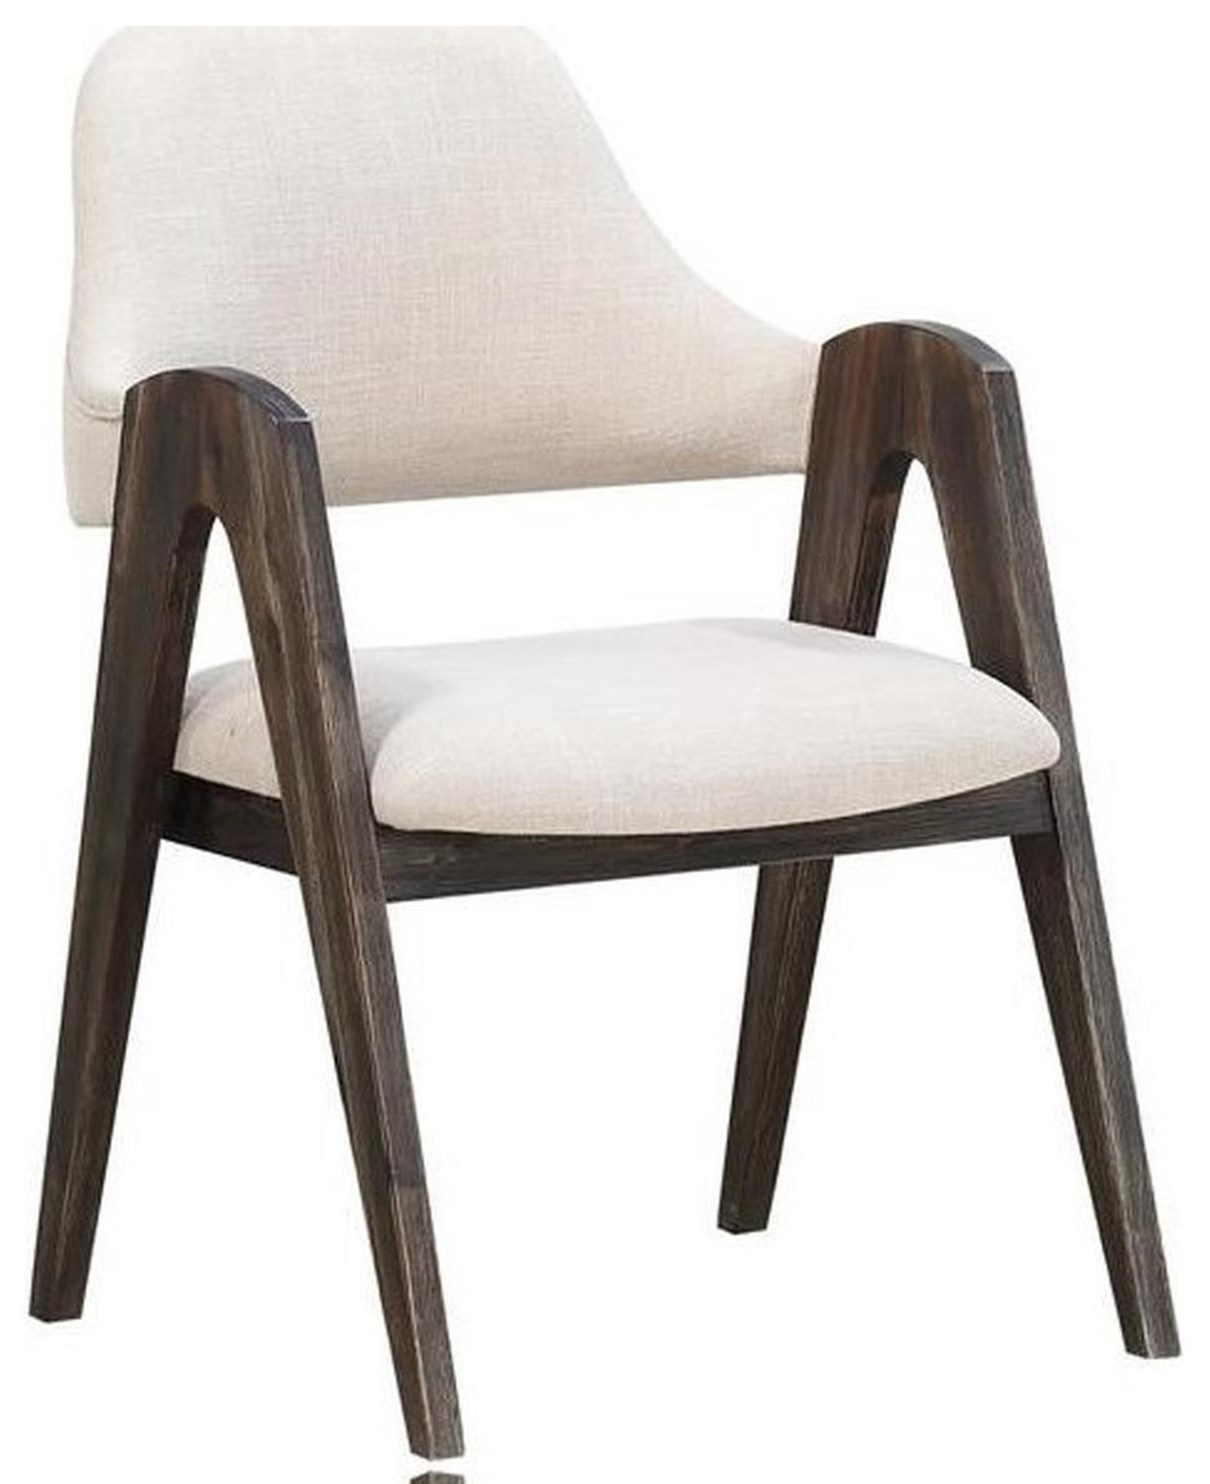 Dining Chair at Williams & Kay